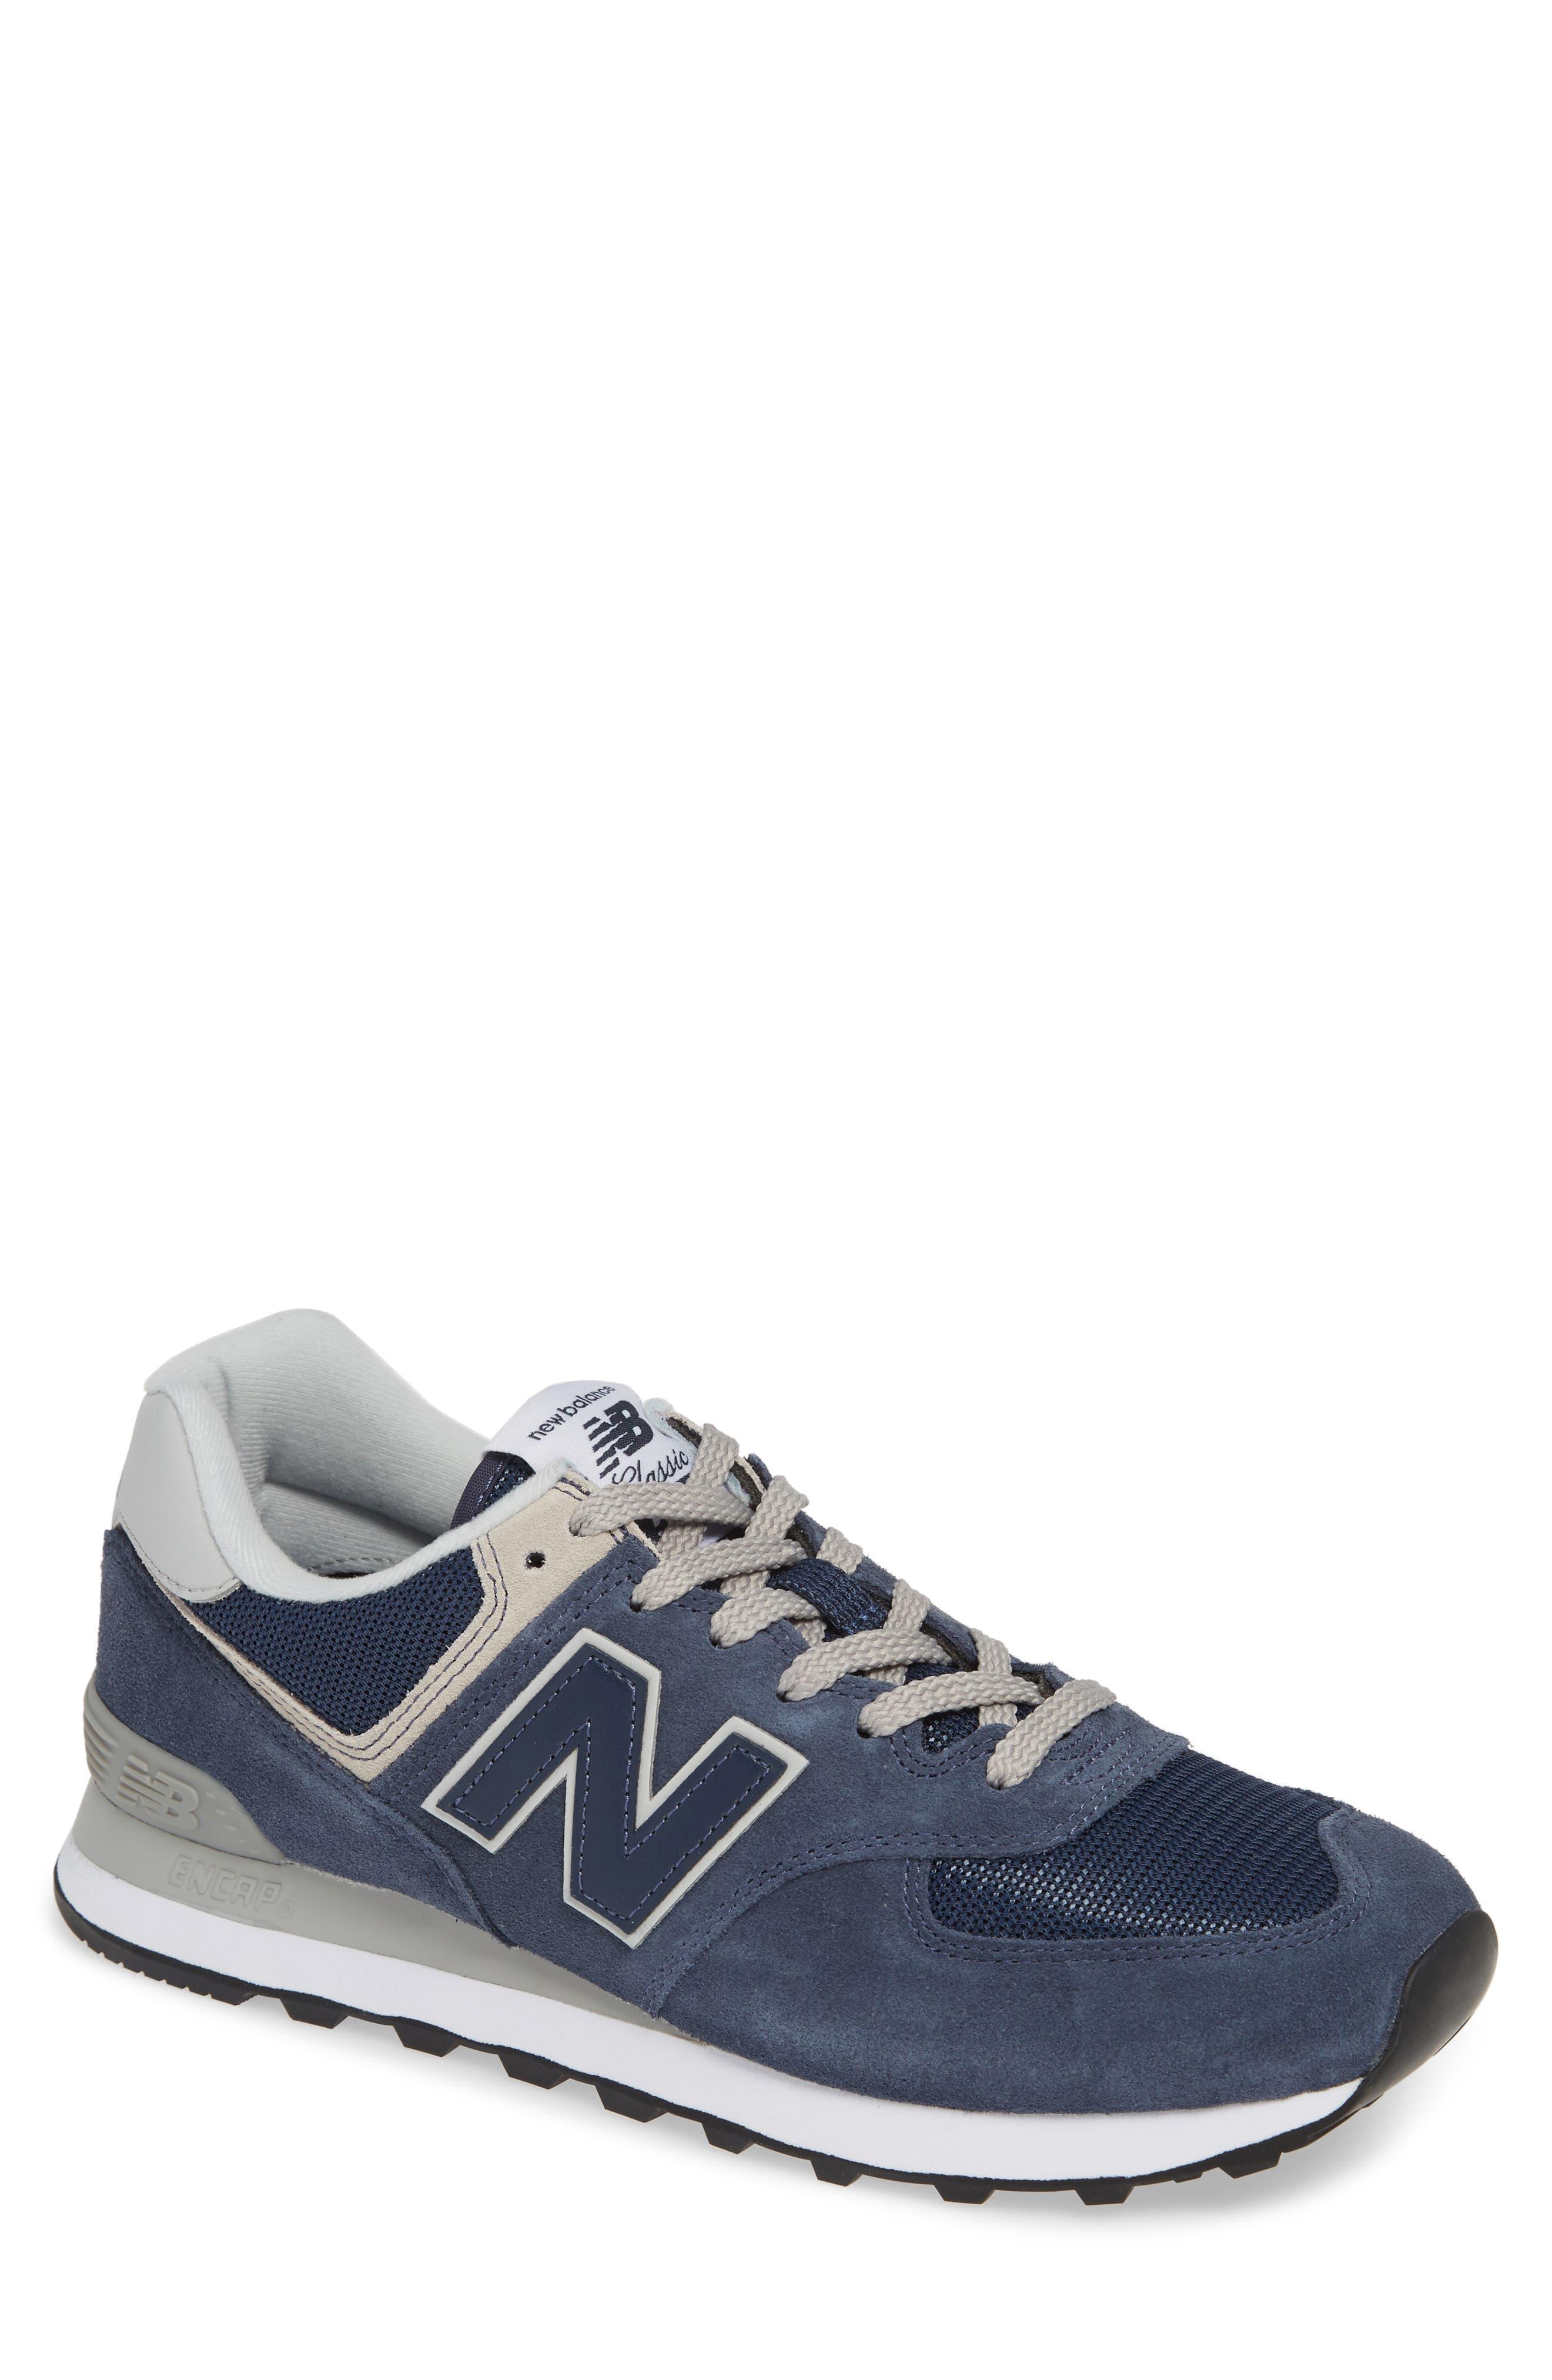 NEW BALANCE 574 Classic Sneaker, Main, color, BLACK IRIS